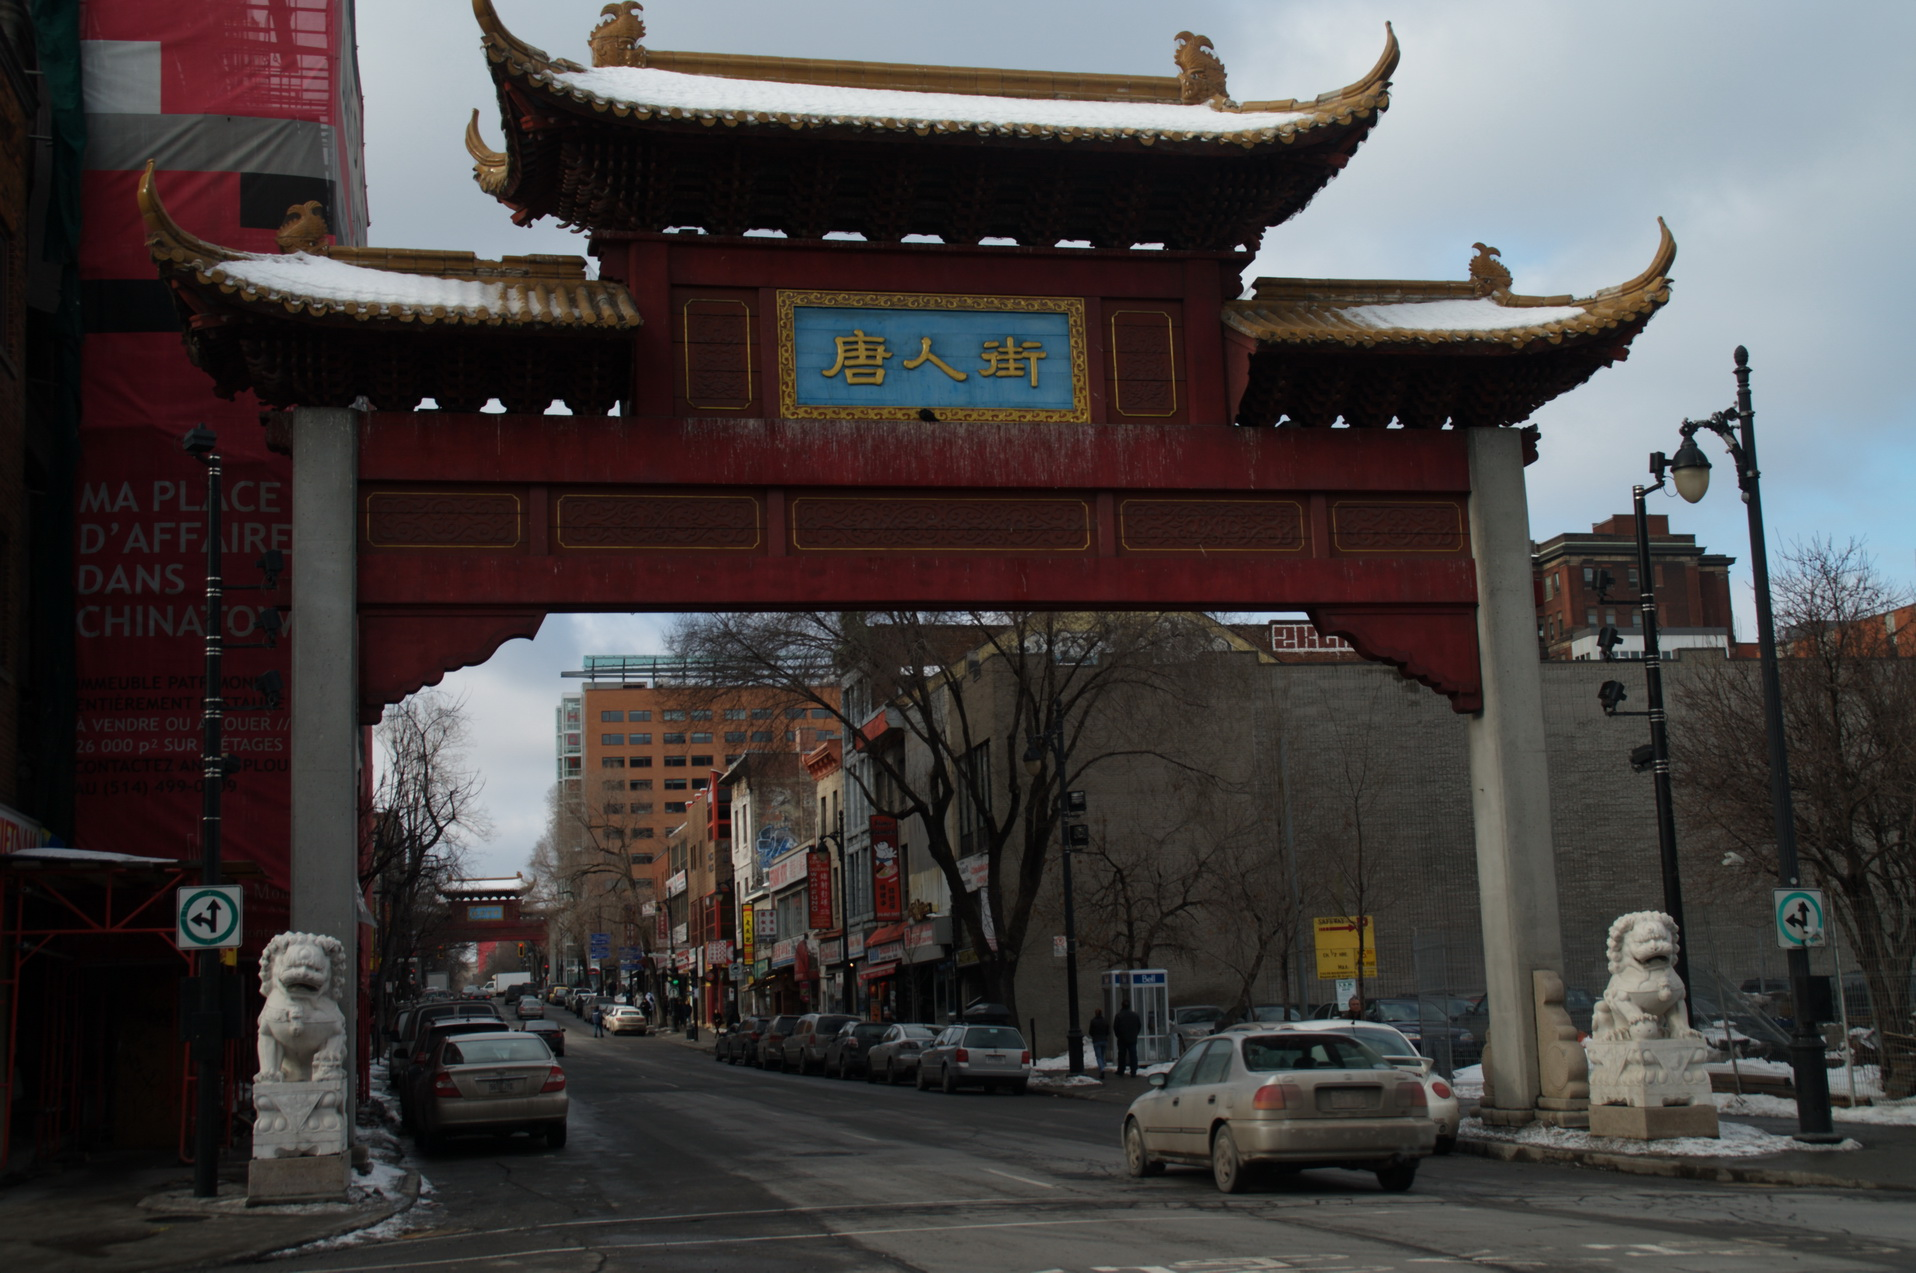 Restaurant Chinois Portes